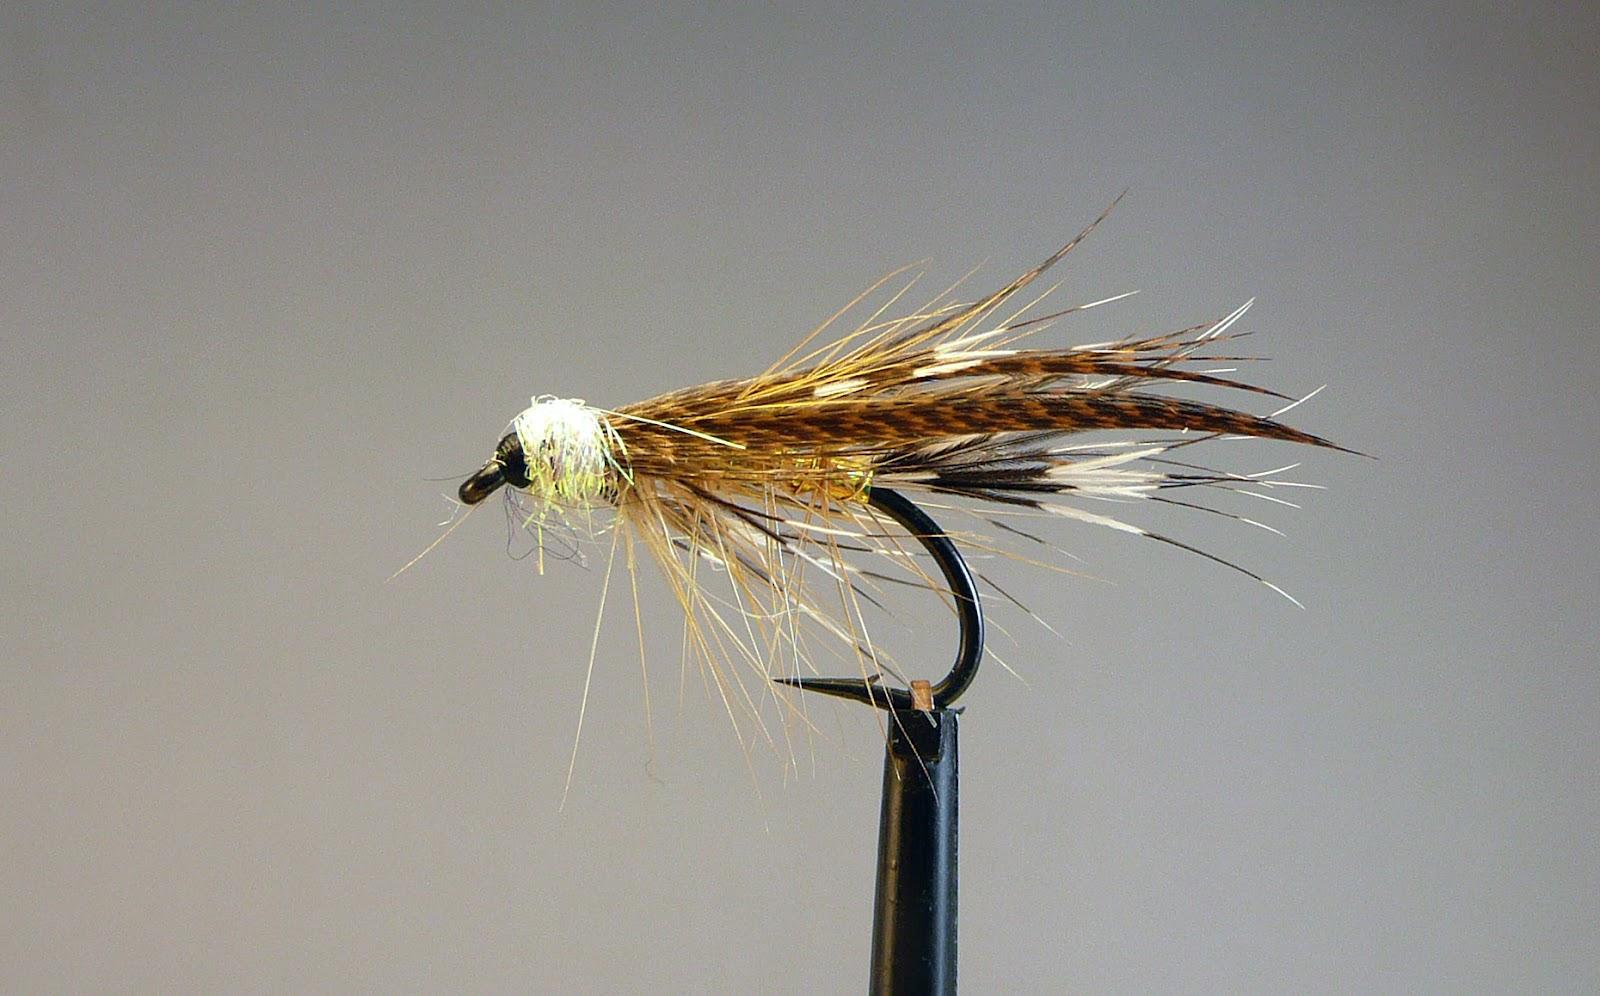 3 X Premium Trout Flies NYMPH SNATCHER GOLDEN JC Fishing fly